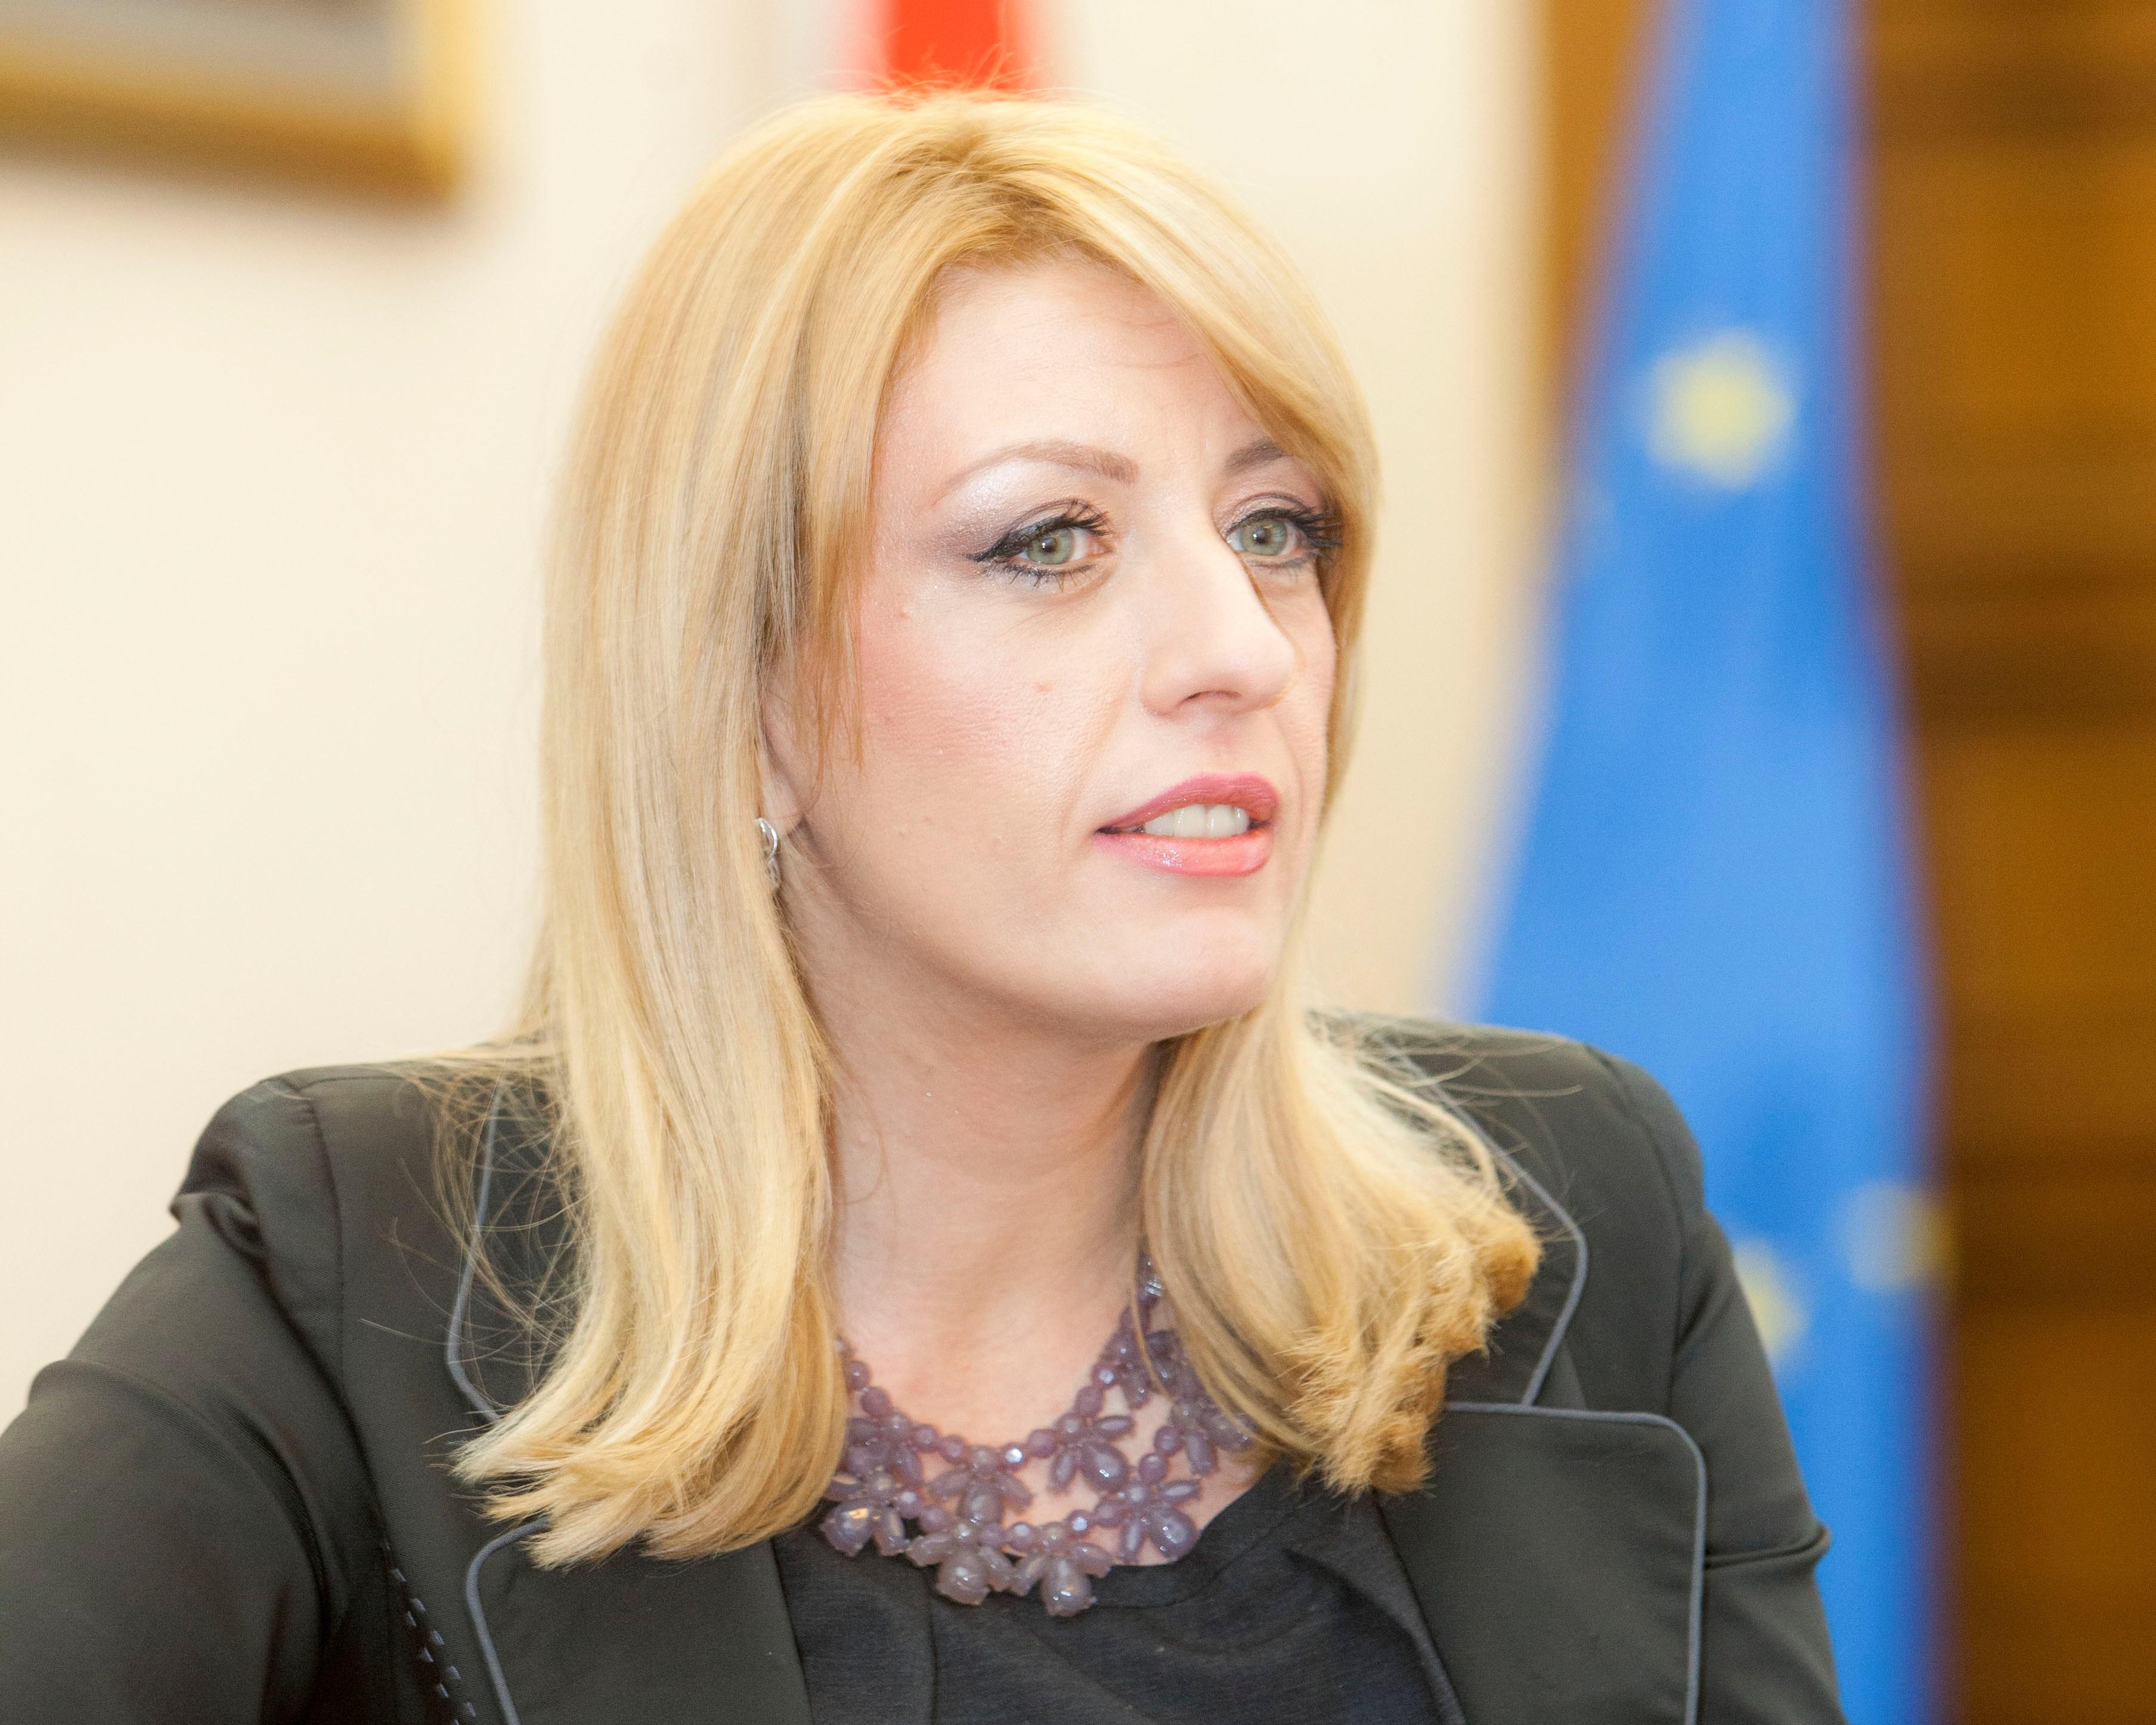 Ministarka Joksimović podržala Paradu ponosa i Ponos trans* osoba